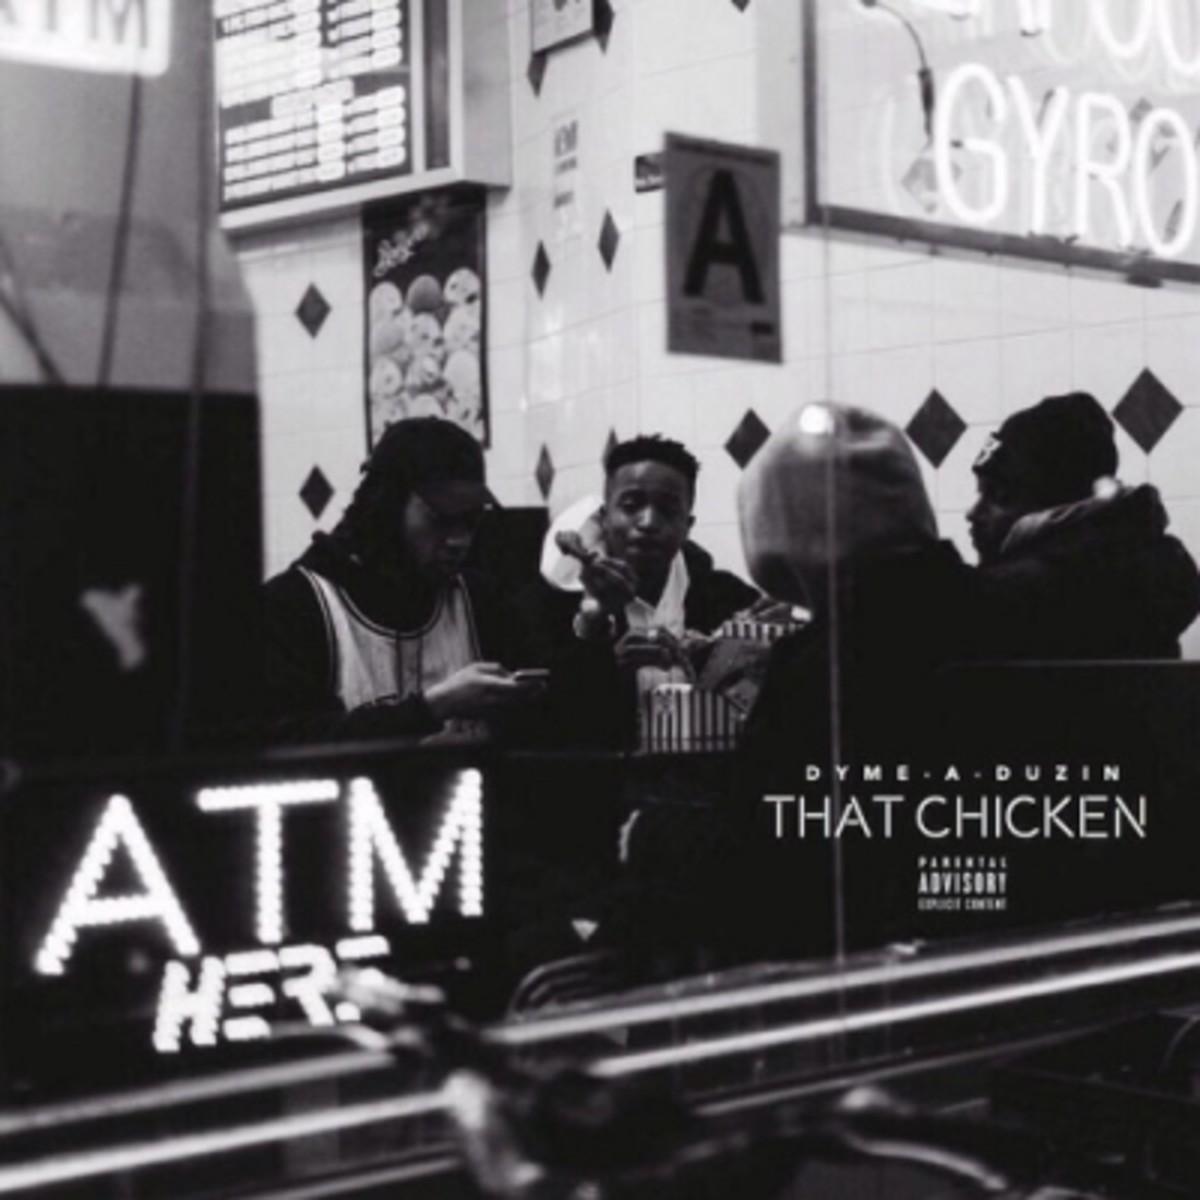 dyme-a-duzin-that-chicken.jpg